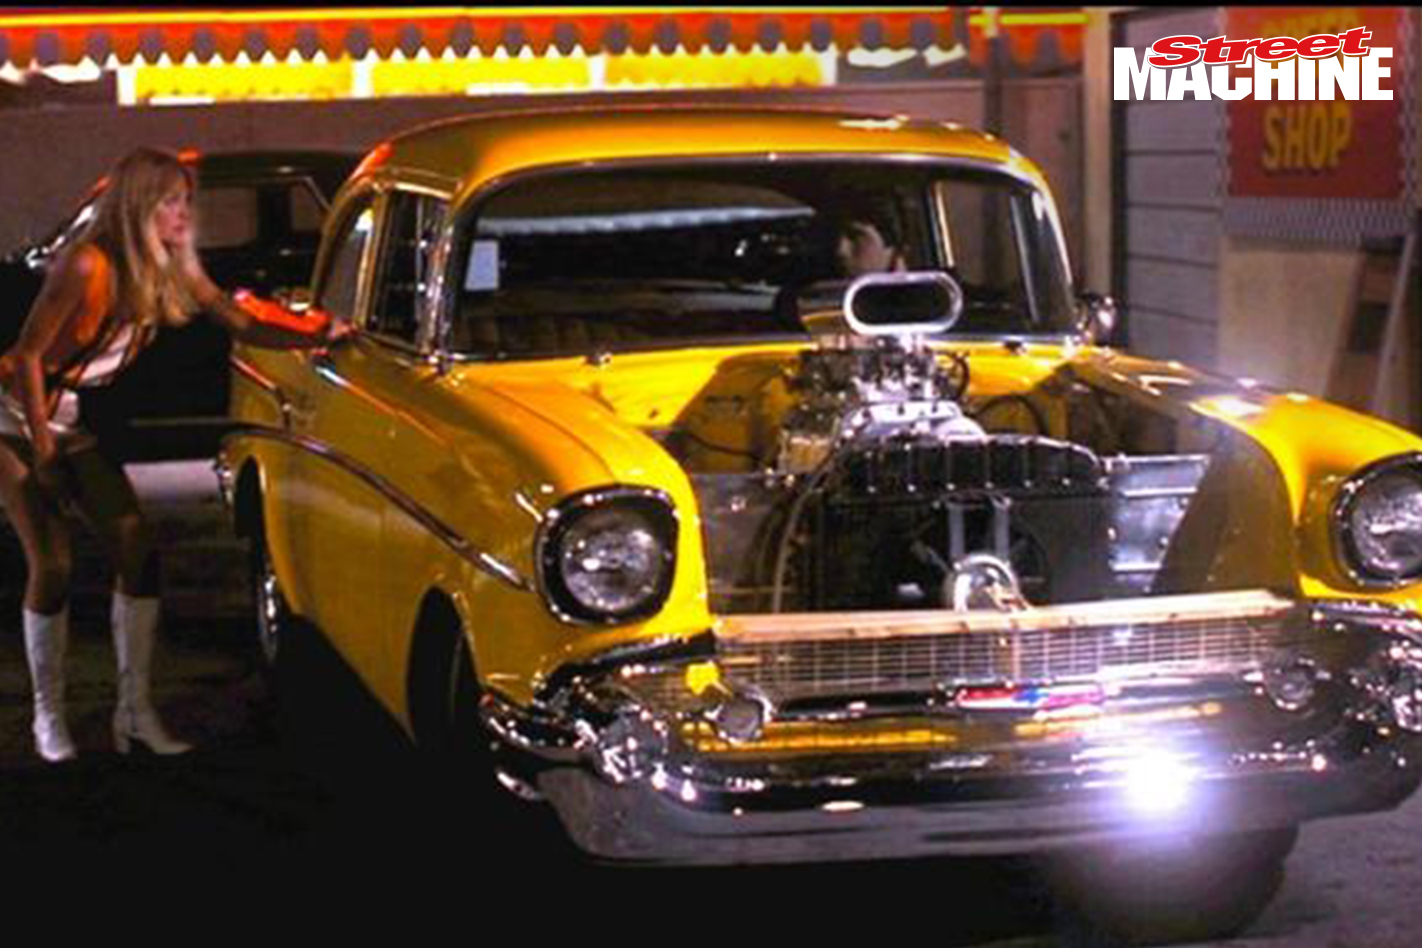 Motor 5 4 Ford Triton >> THE HOLLYWOOD KNIGHTS (1980): RIPPER CAR MOVIES